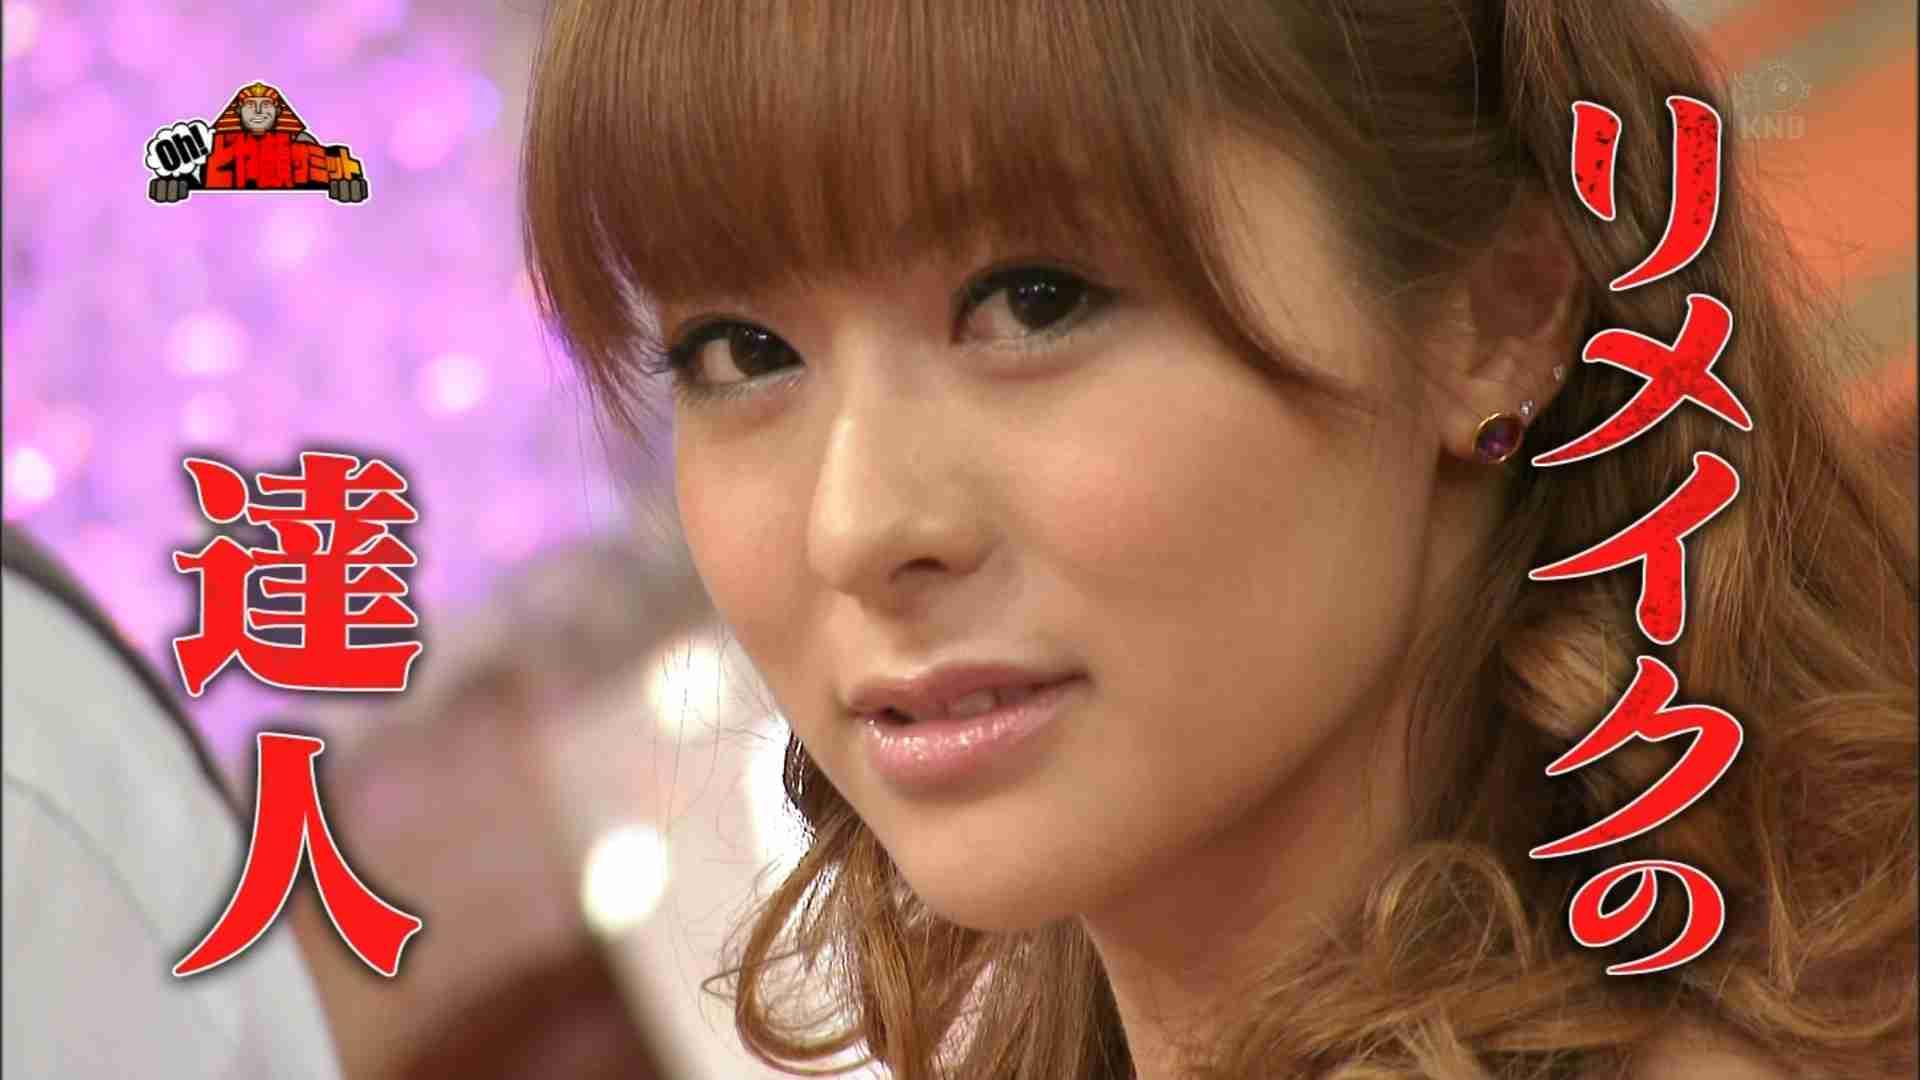 神戸蘭子の画像 p1_34